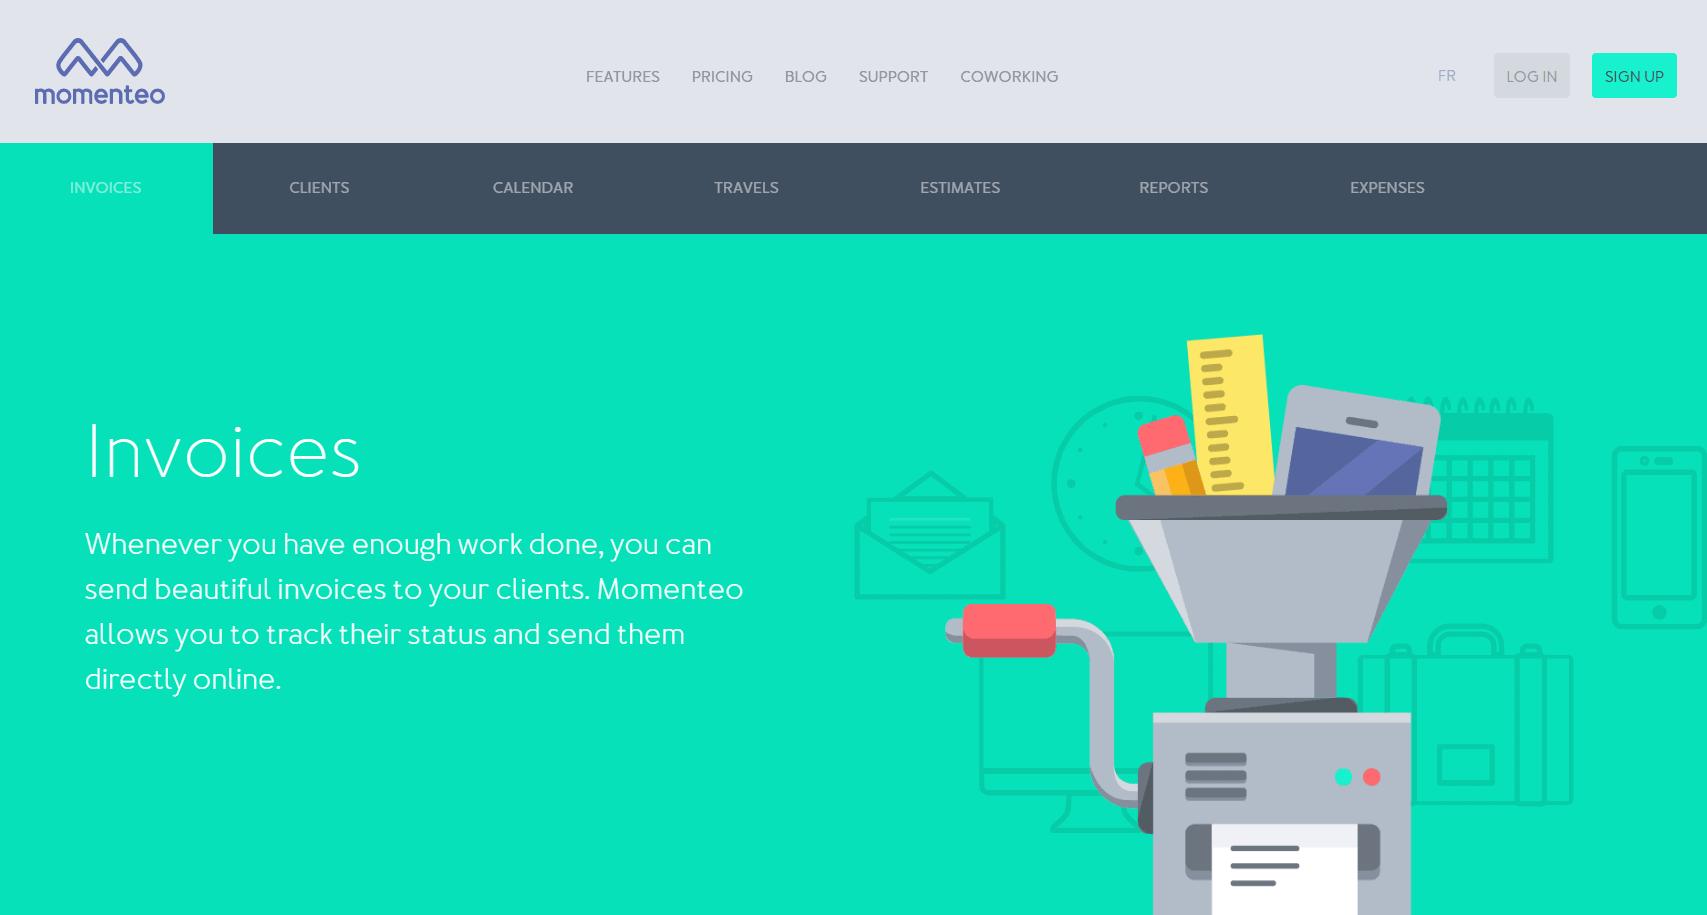 Momenteo freelance invoices